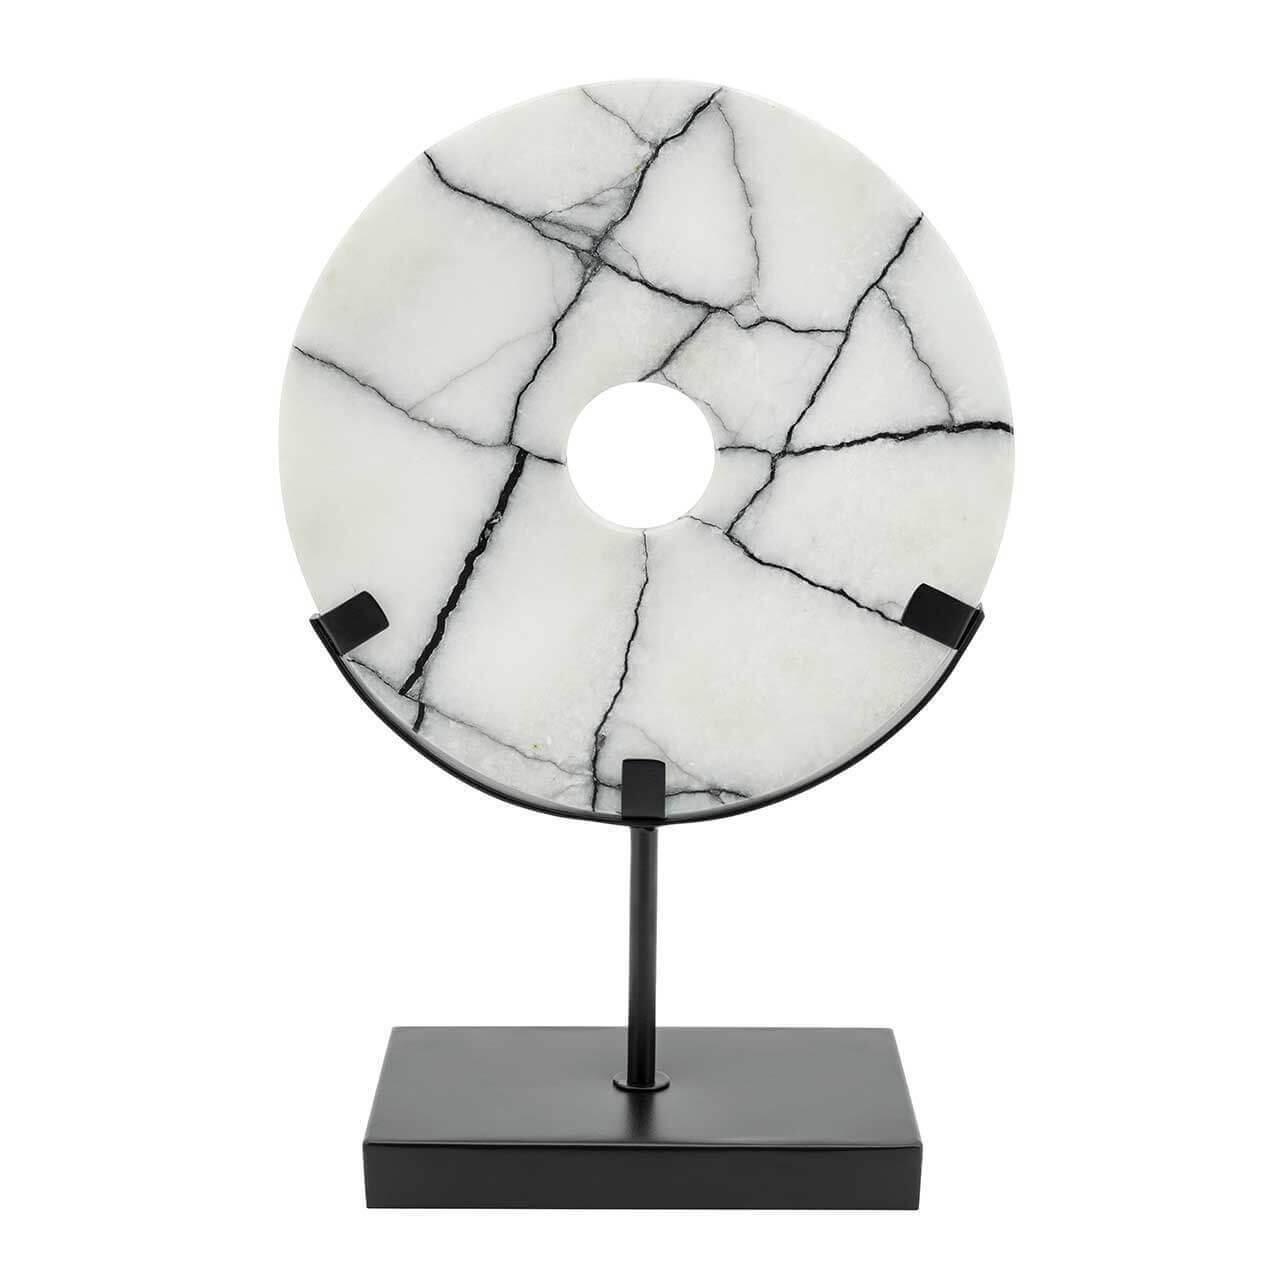 ABHIKA Disk Madison+Stand, H31 20x10, Black/White